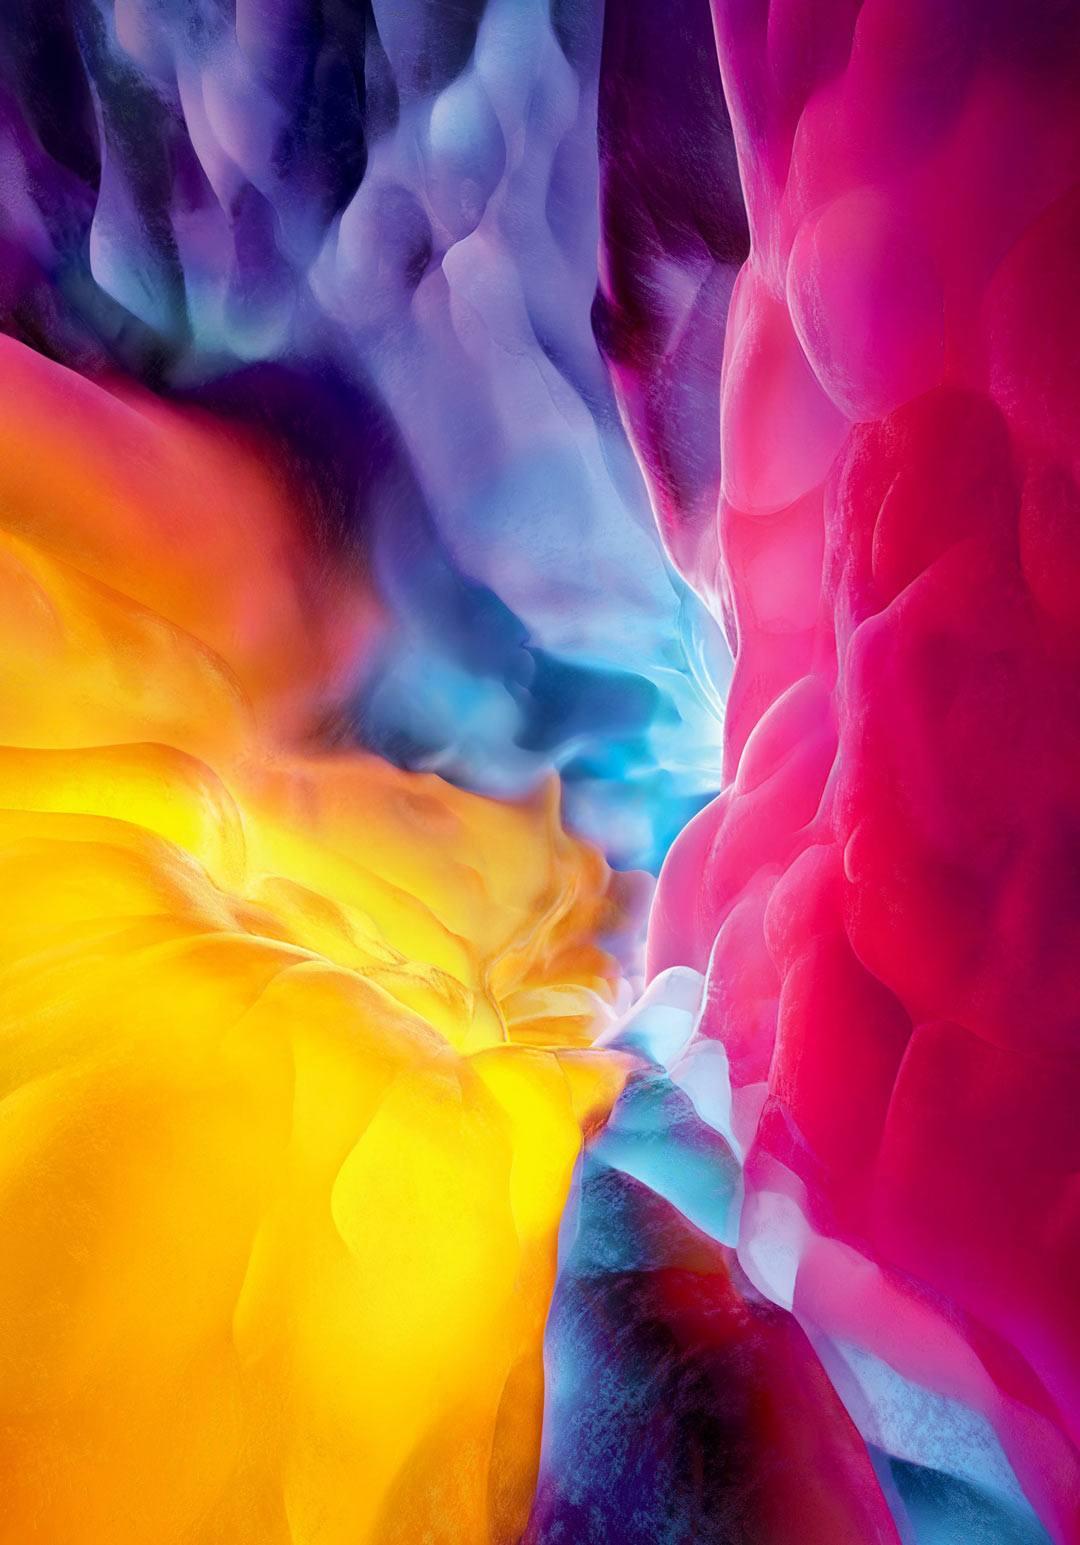 Official iPad Pro 2020 Wallpapers - Download | Technastic